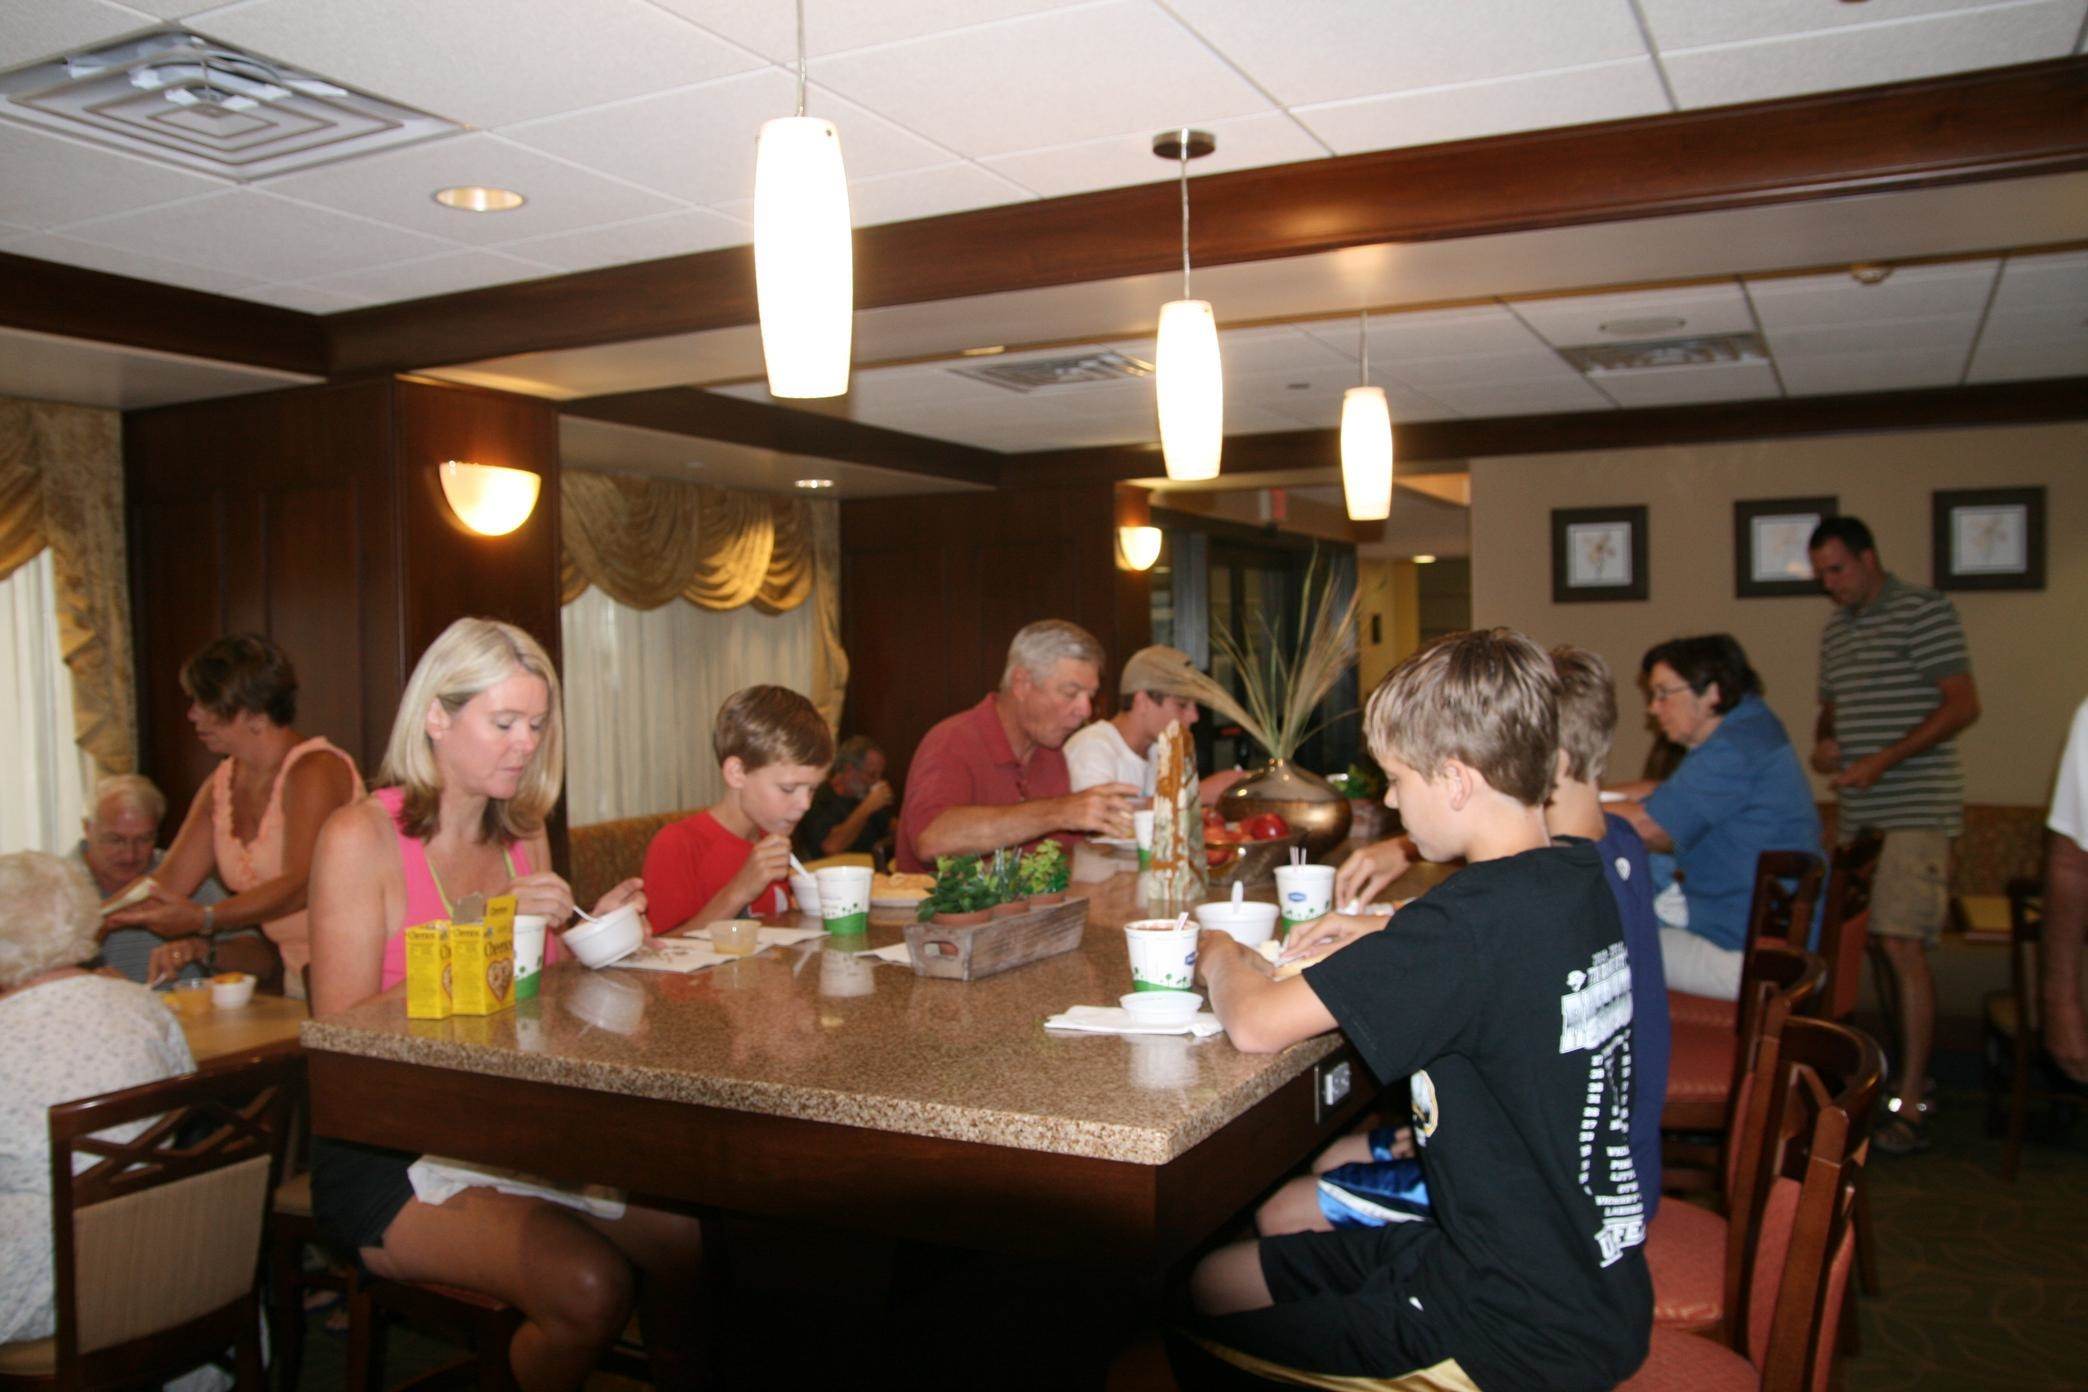 Hampton Inn Roanoke/Hollins - I-81 image 4